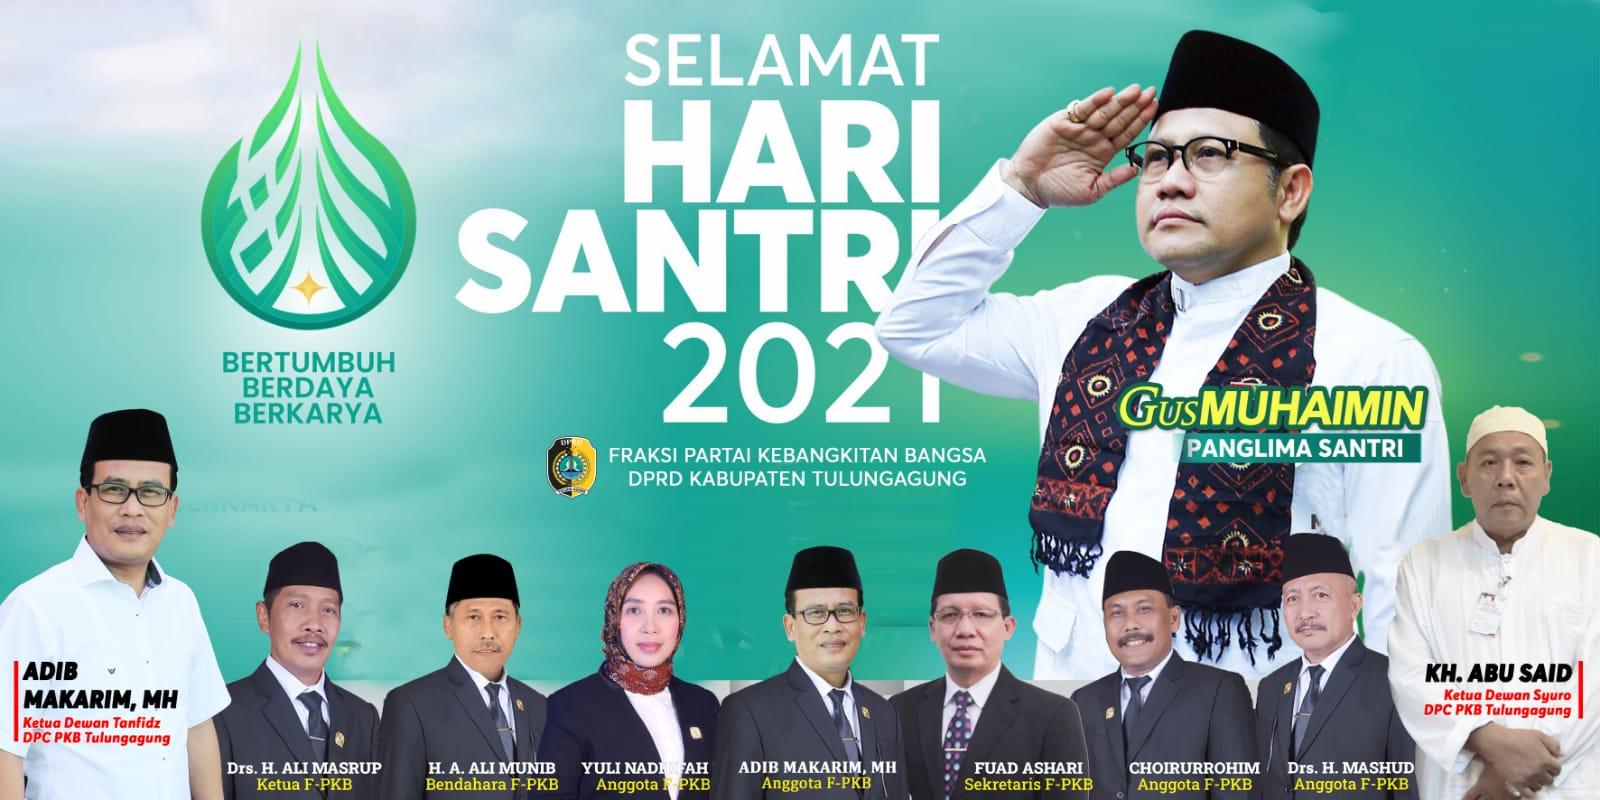 https://risetcdn.jatimtimes.com/images/2021/10/18/harisantri-gusmuh-dprd-kabupaten-tulungagungadb713ef474d05c6.jpg